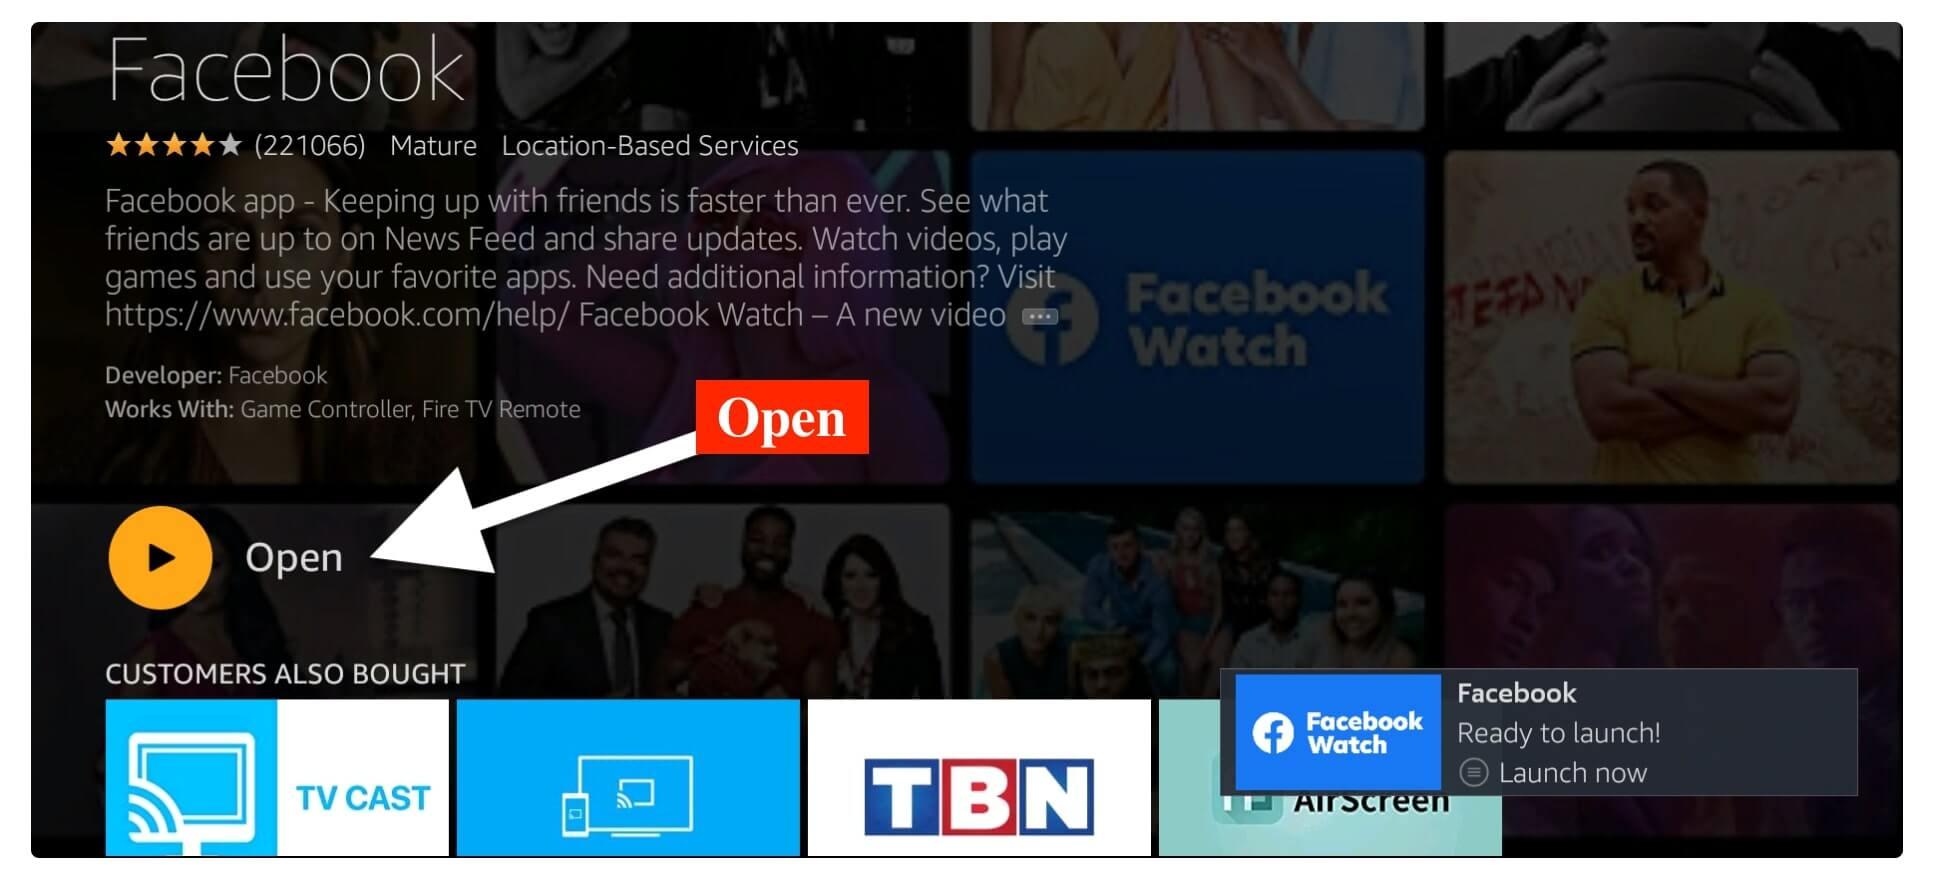 Facebook-Watch-on-Amazon-Firestick